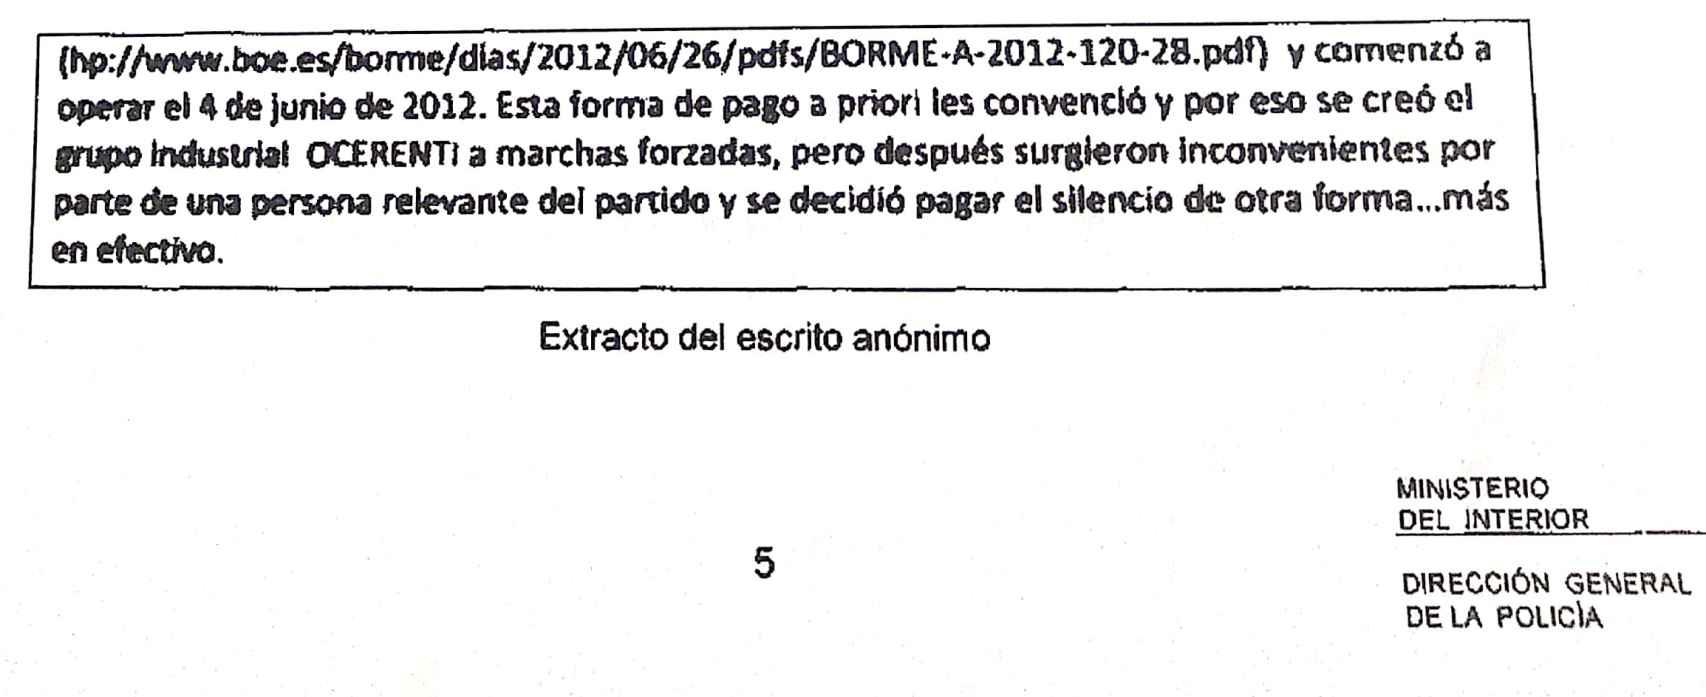 Extracto del manuscrito anónimo remitido al juez José De la Mata.